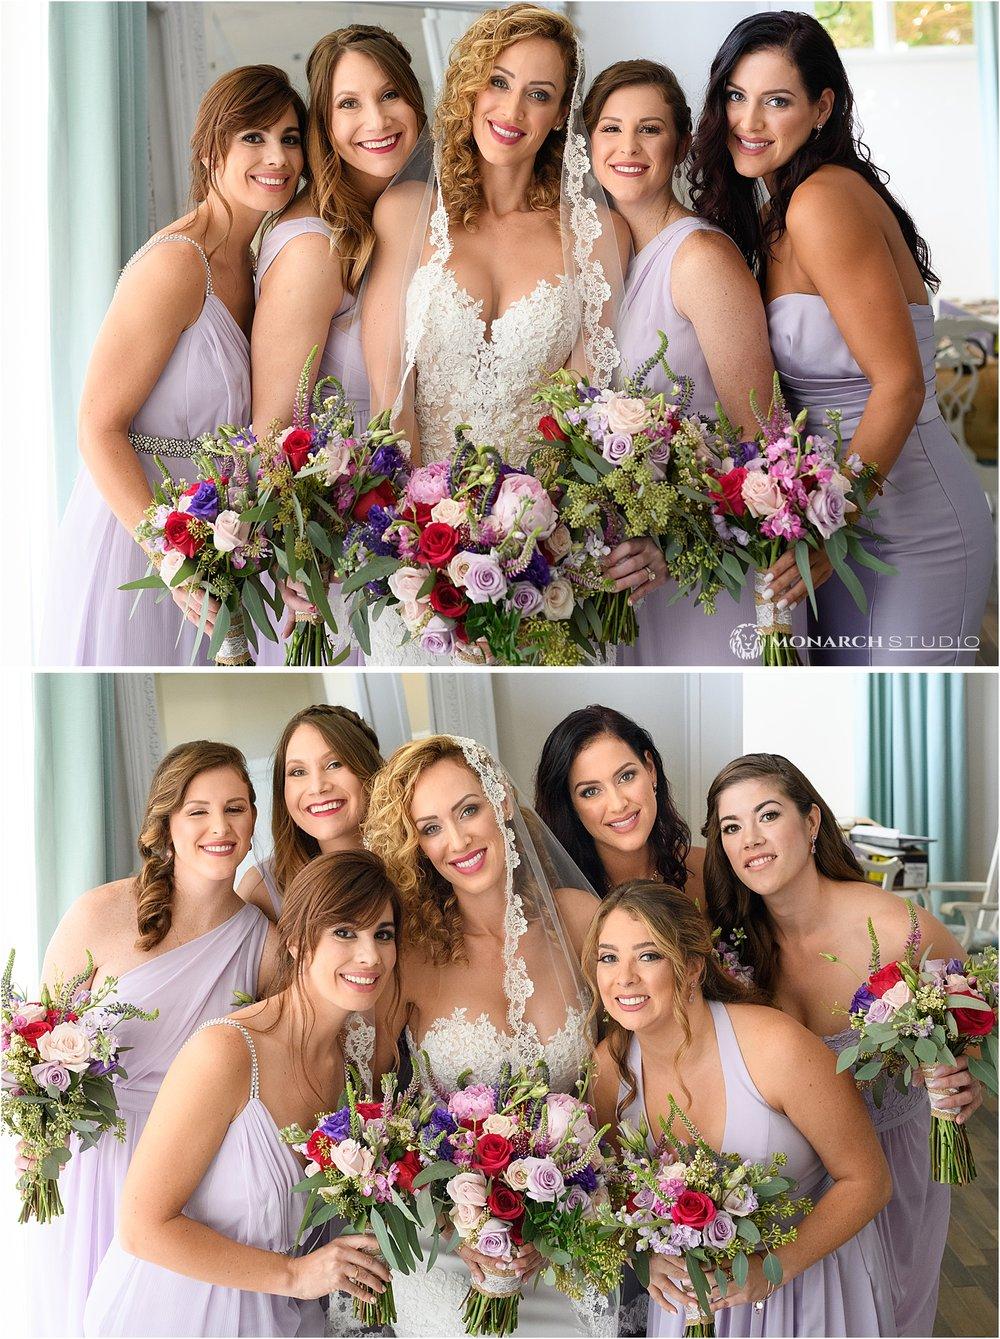 The-Whiteroom-Wedding-Photography-Saint-Augustine-Florida (51).jpg